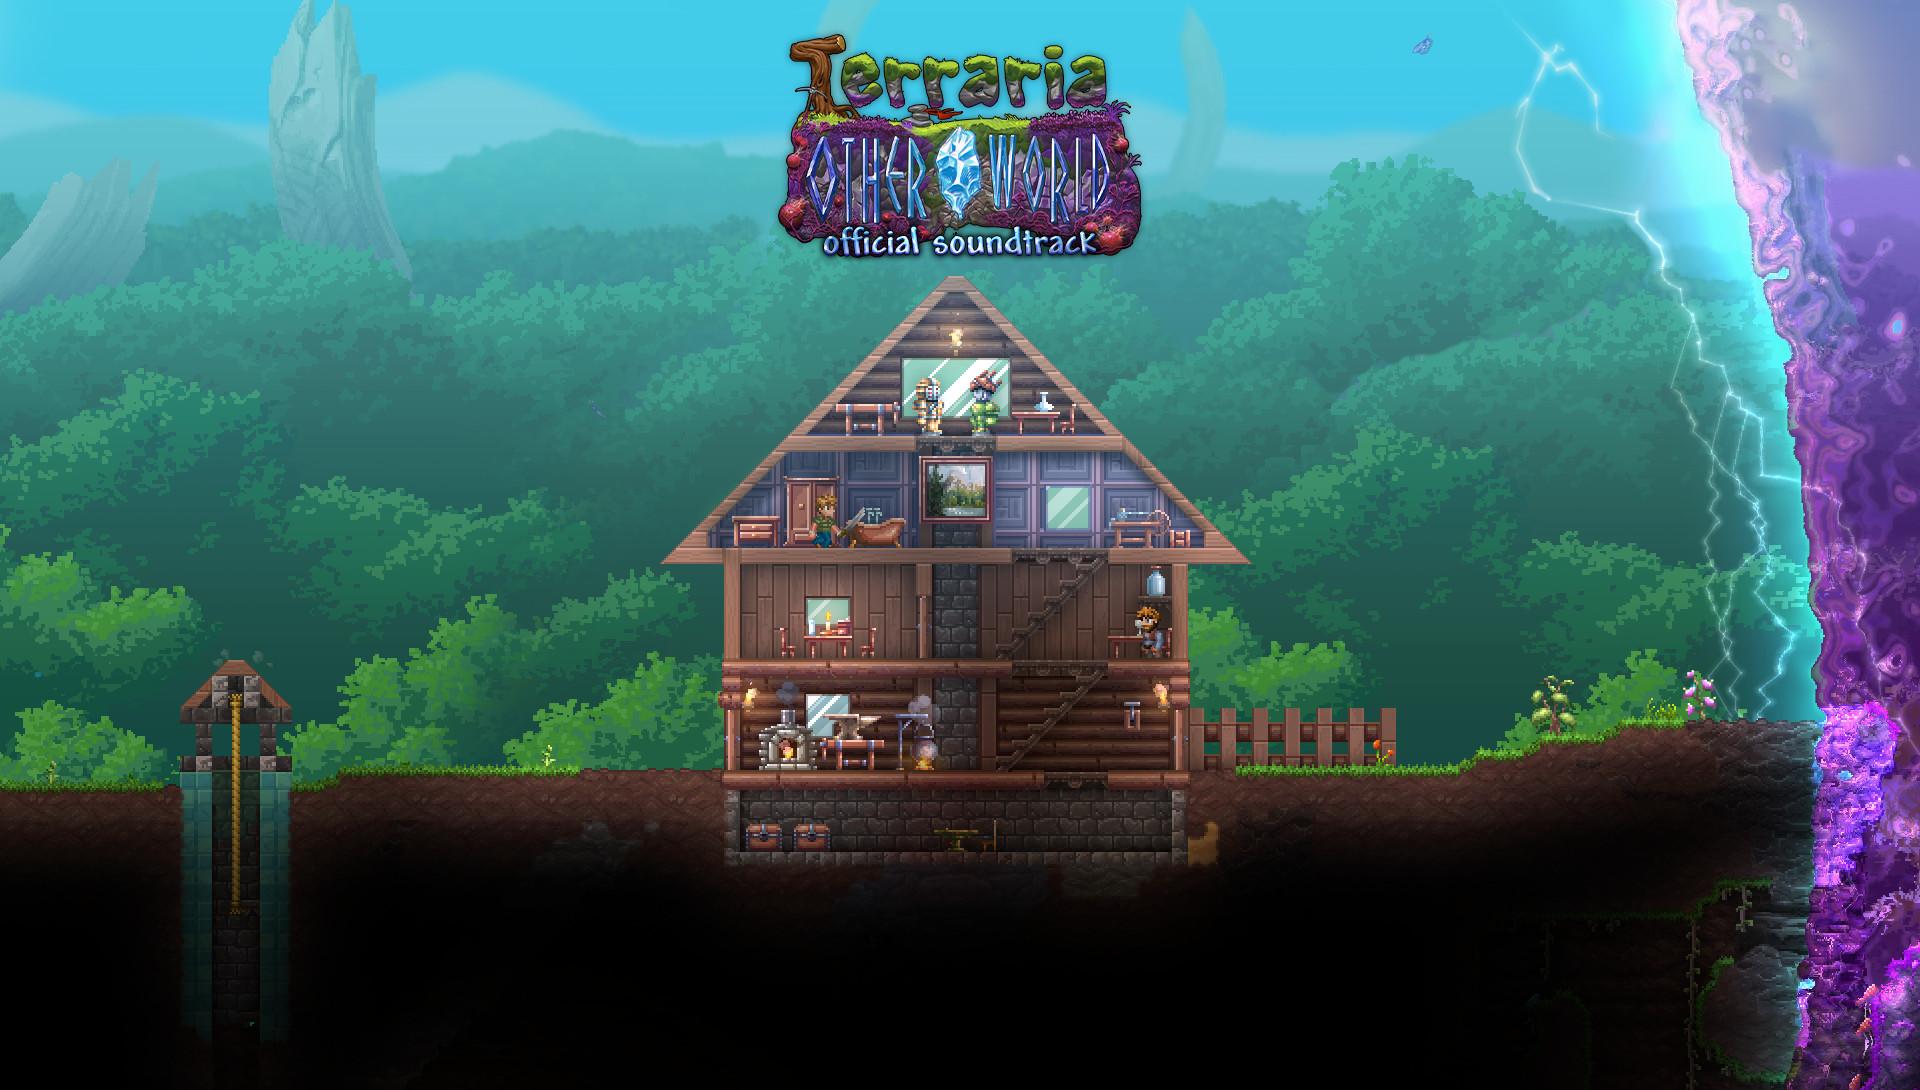 Terraria: Otherworld Official Soundtrack screenshot